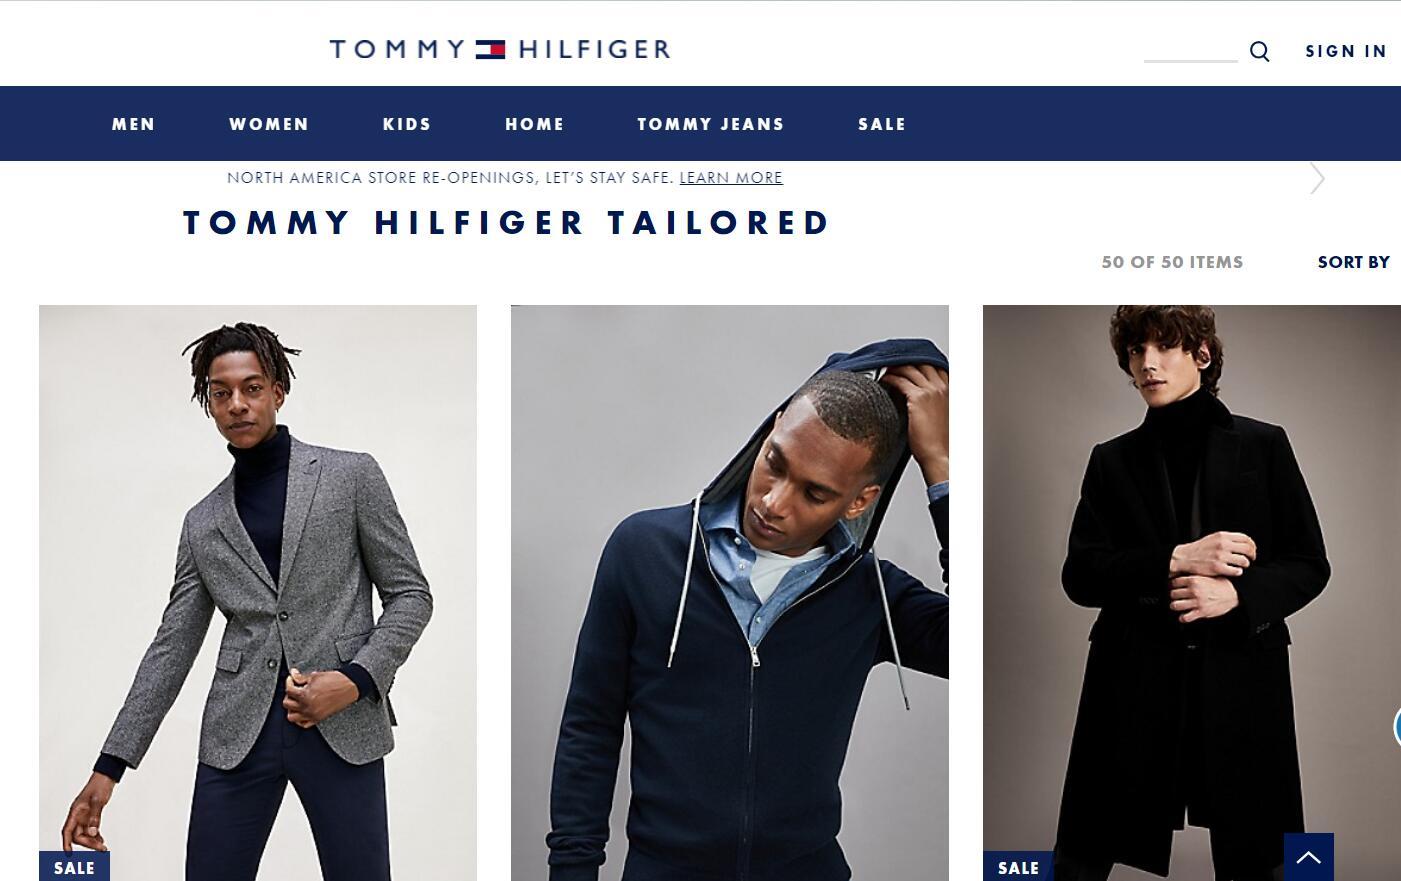 Tommy Hilfiger 男装定制系列与意大利定制服装企业 Lardini 签订授权协议